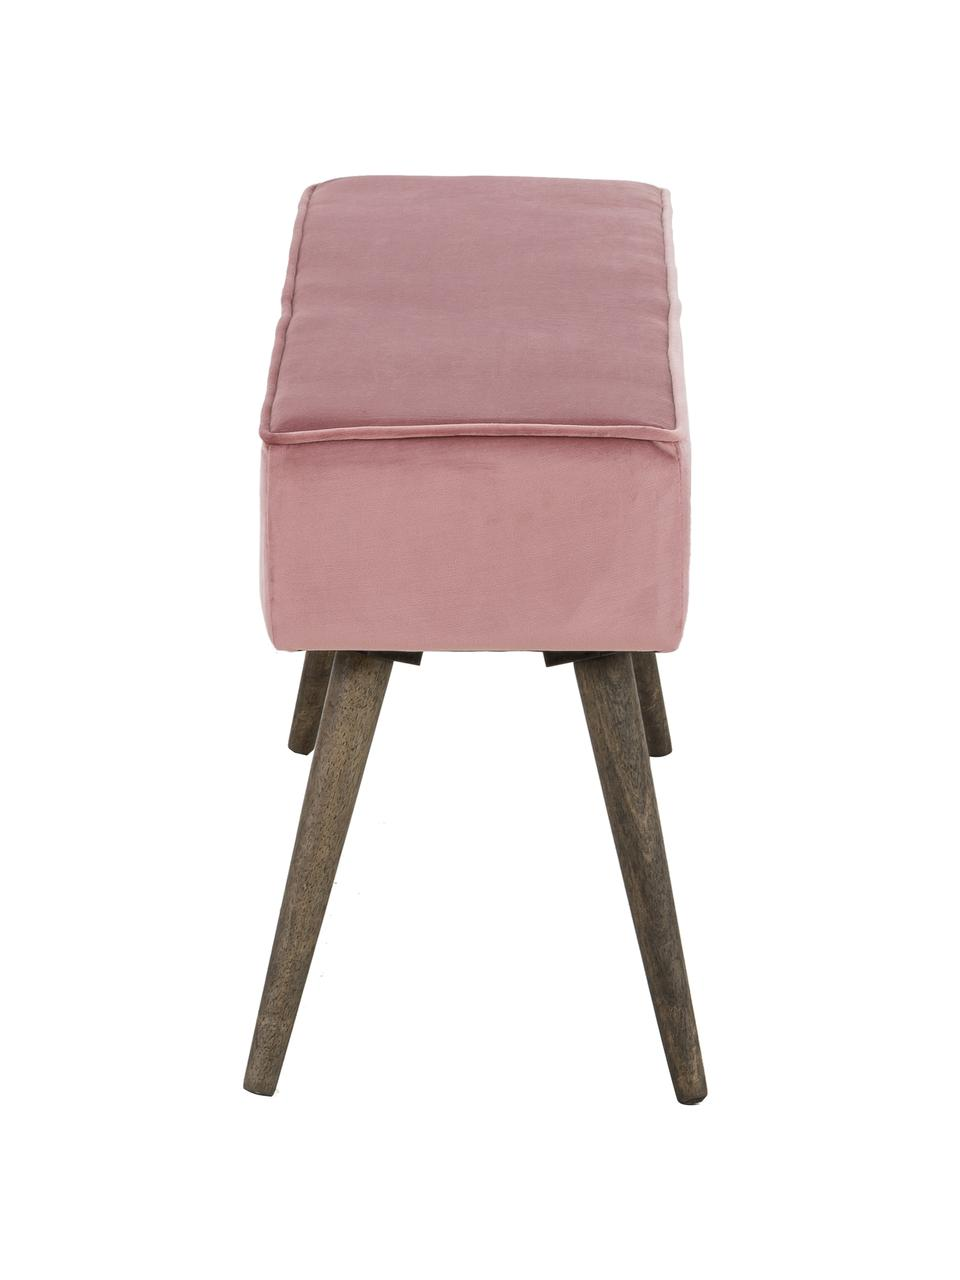 Samt-Polsterbank Popy, Bezug: Polyestersamt Der Bezug w, Beine: Gummibaumholz, klar lacki, Pink, 100 x 50 cm